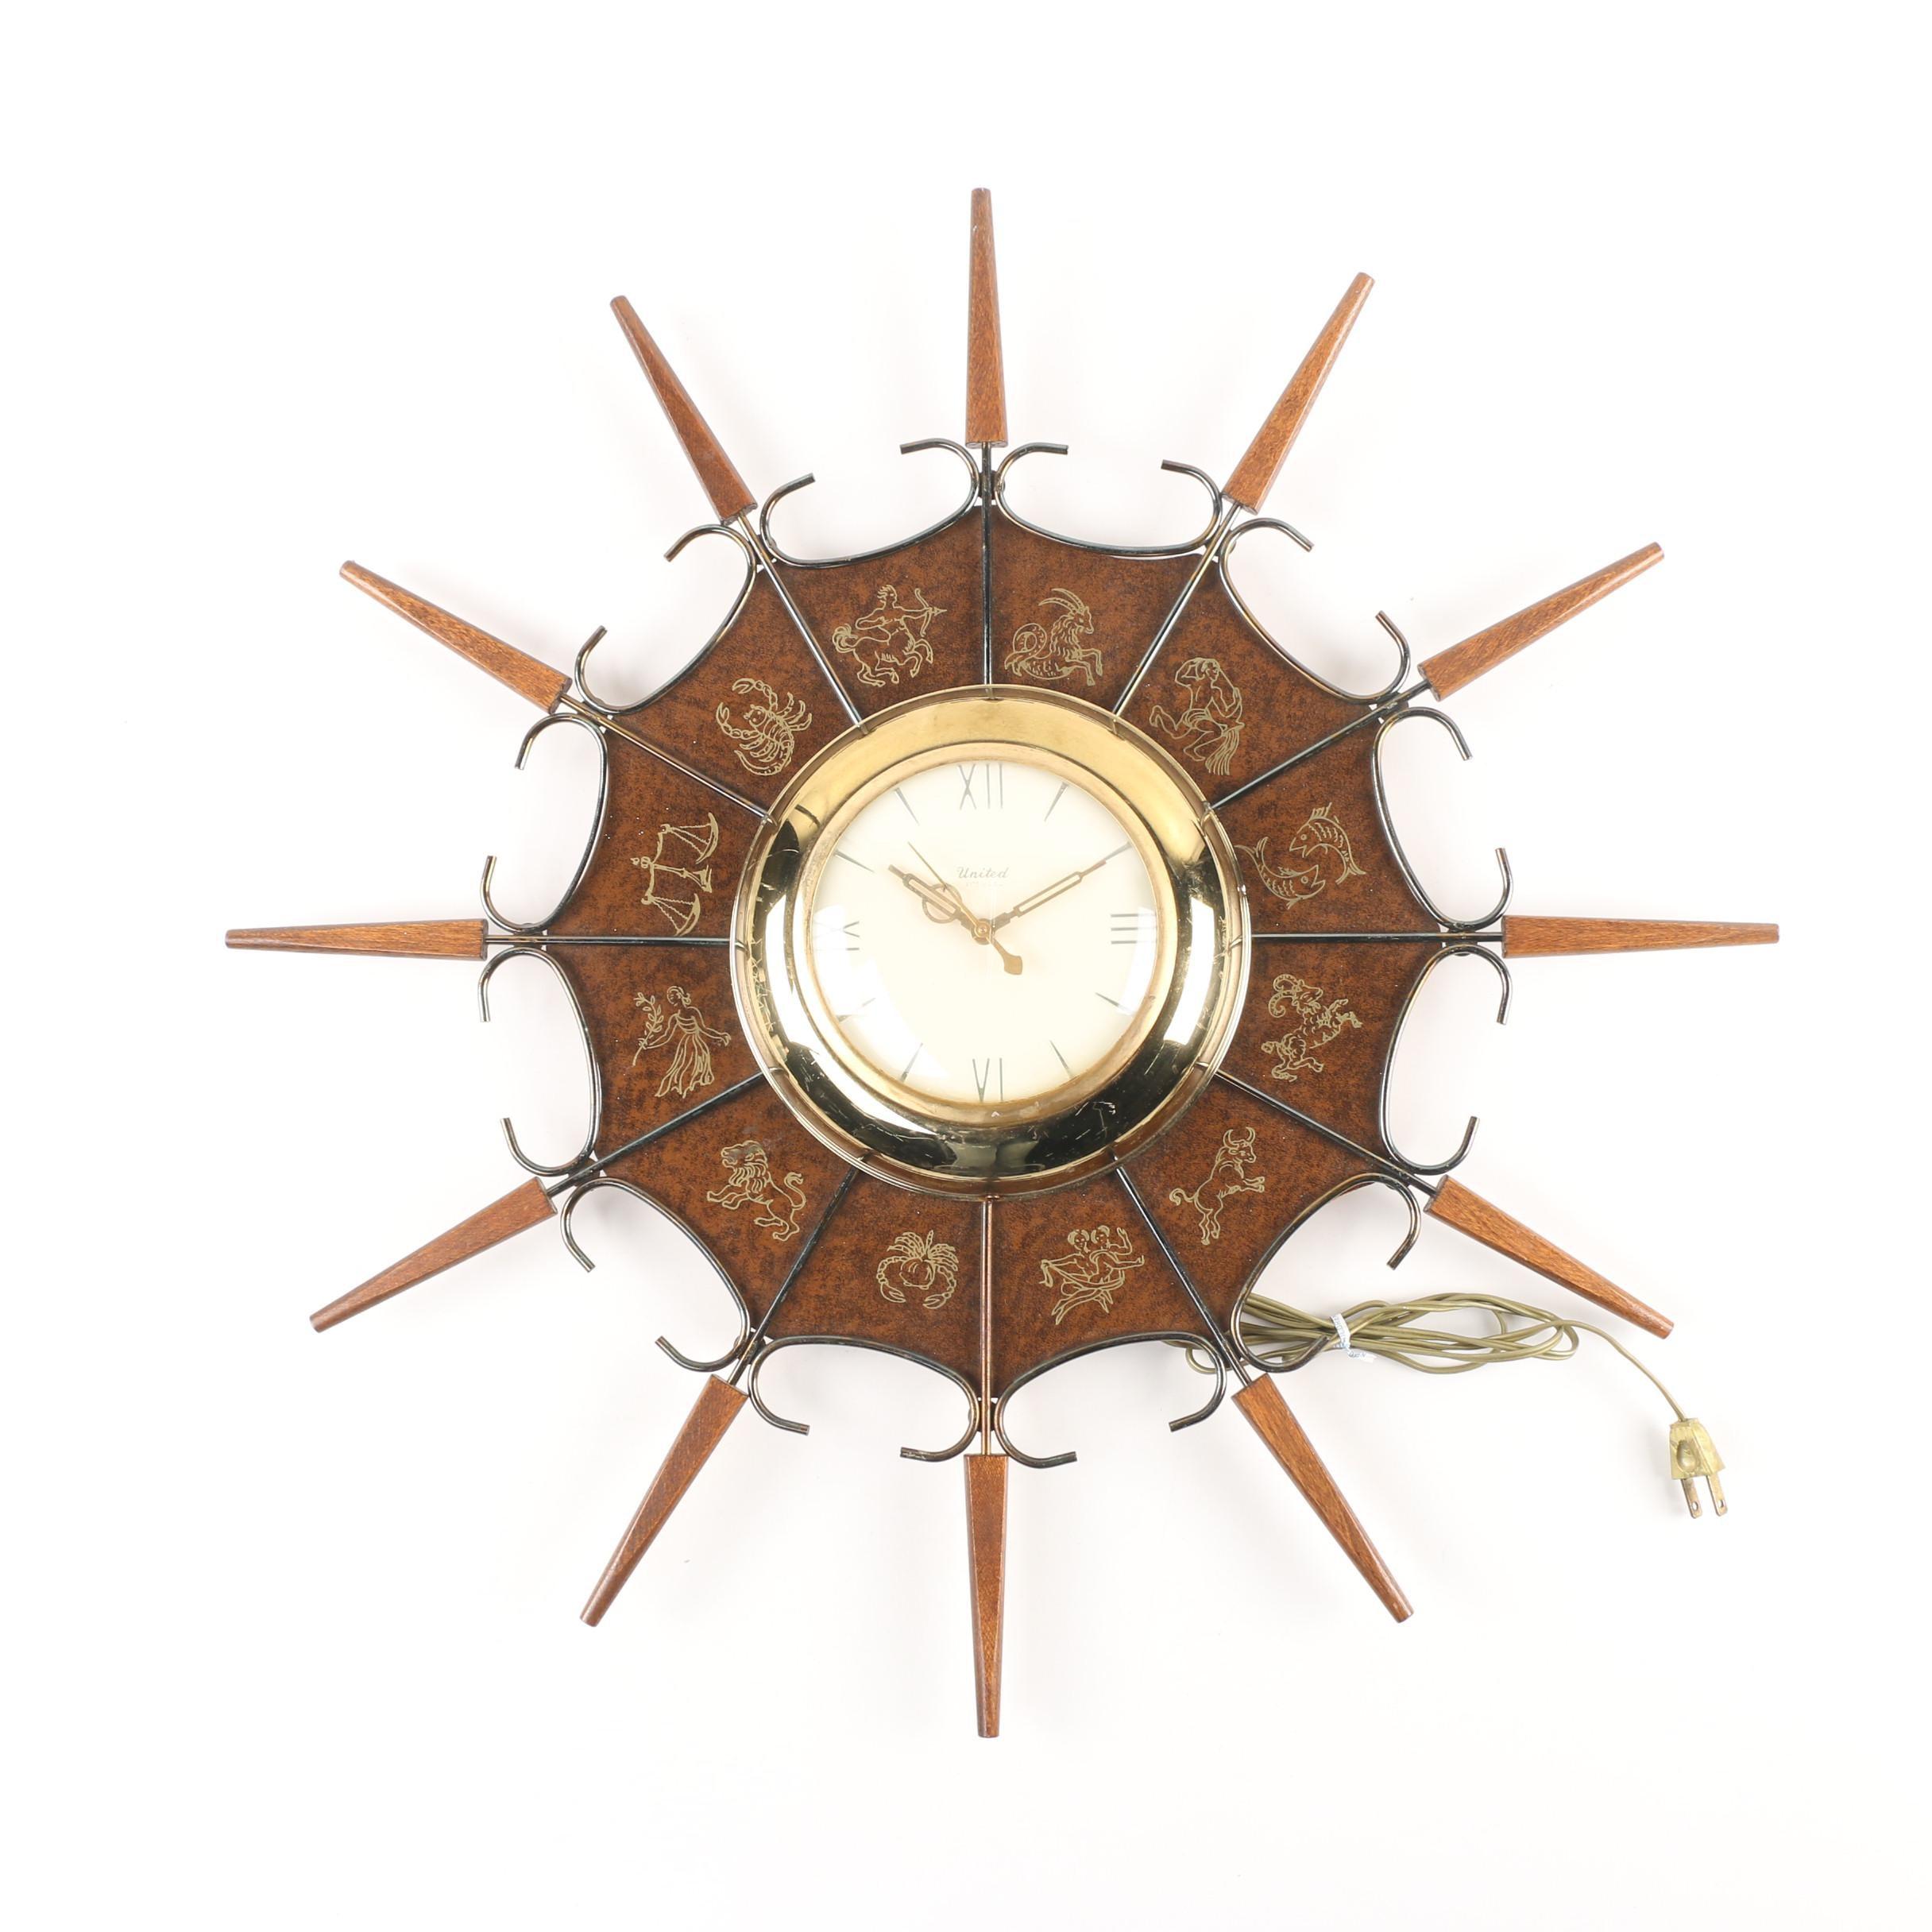 United Zodiac Sunburst Wall Clock, Mid-Century